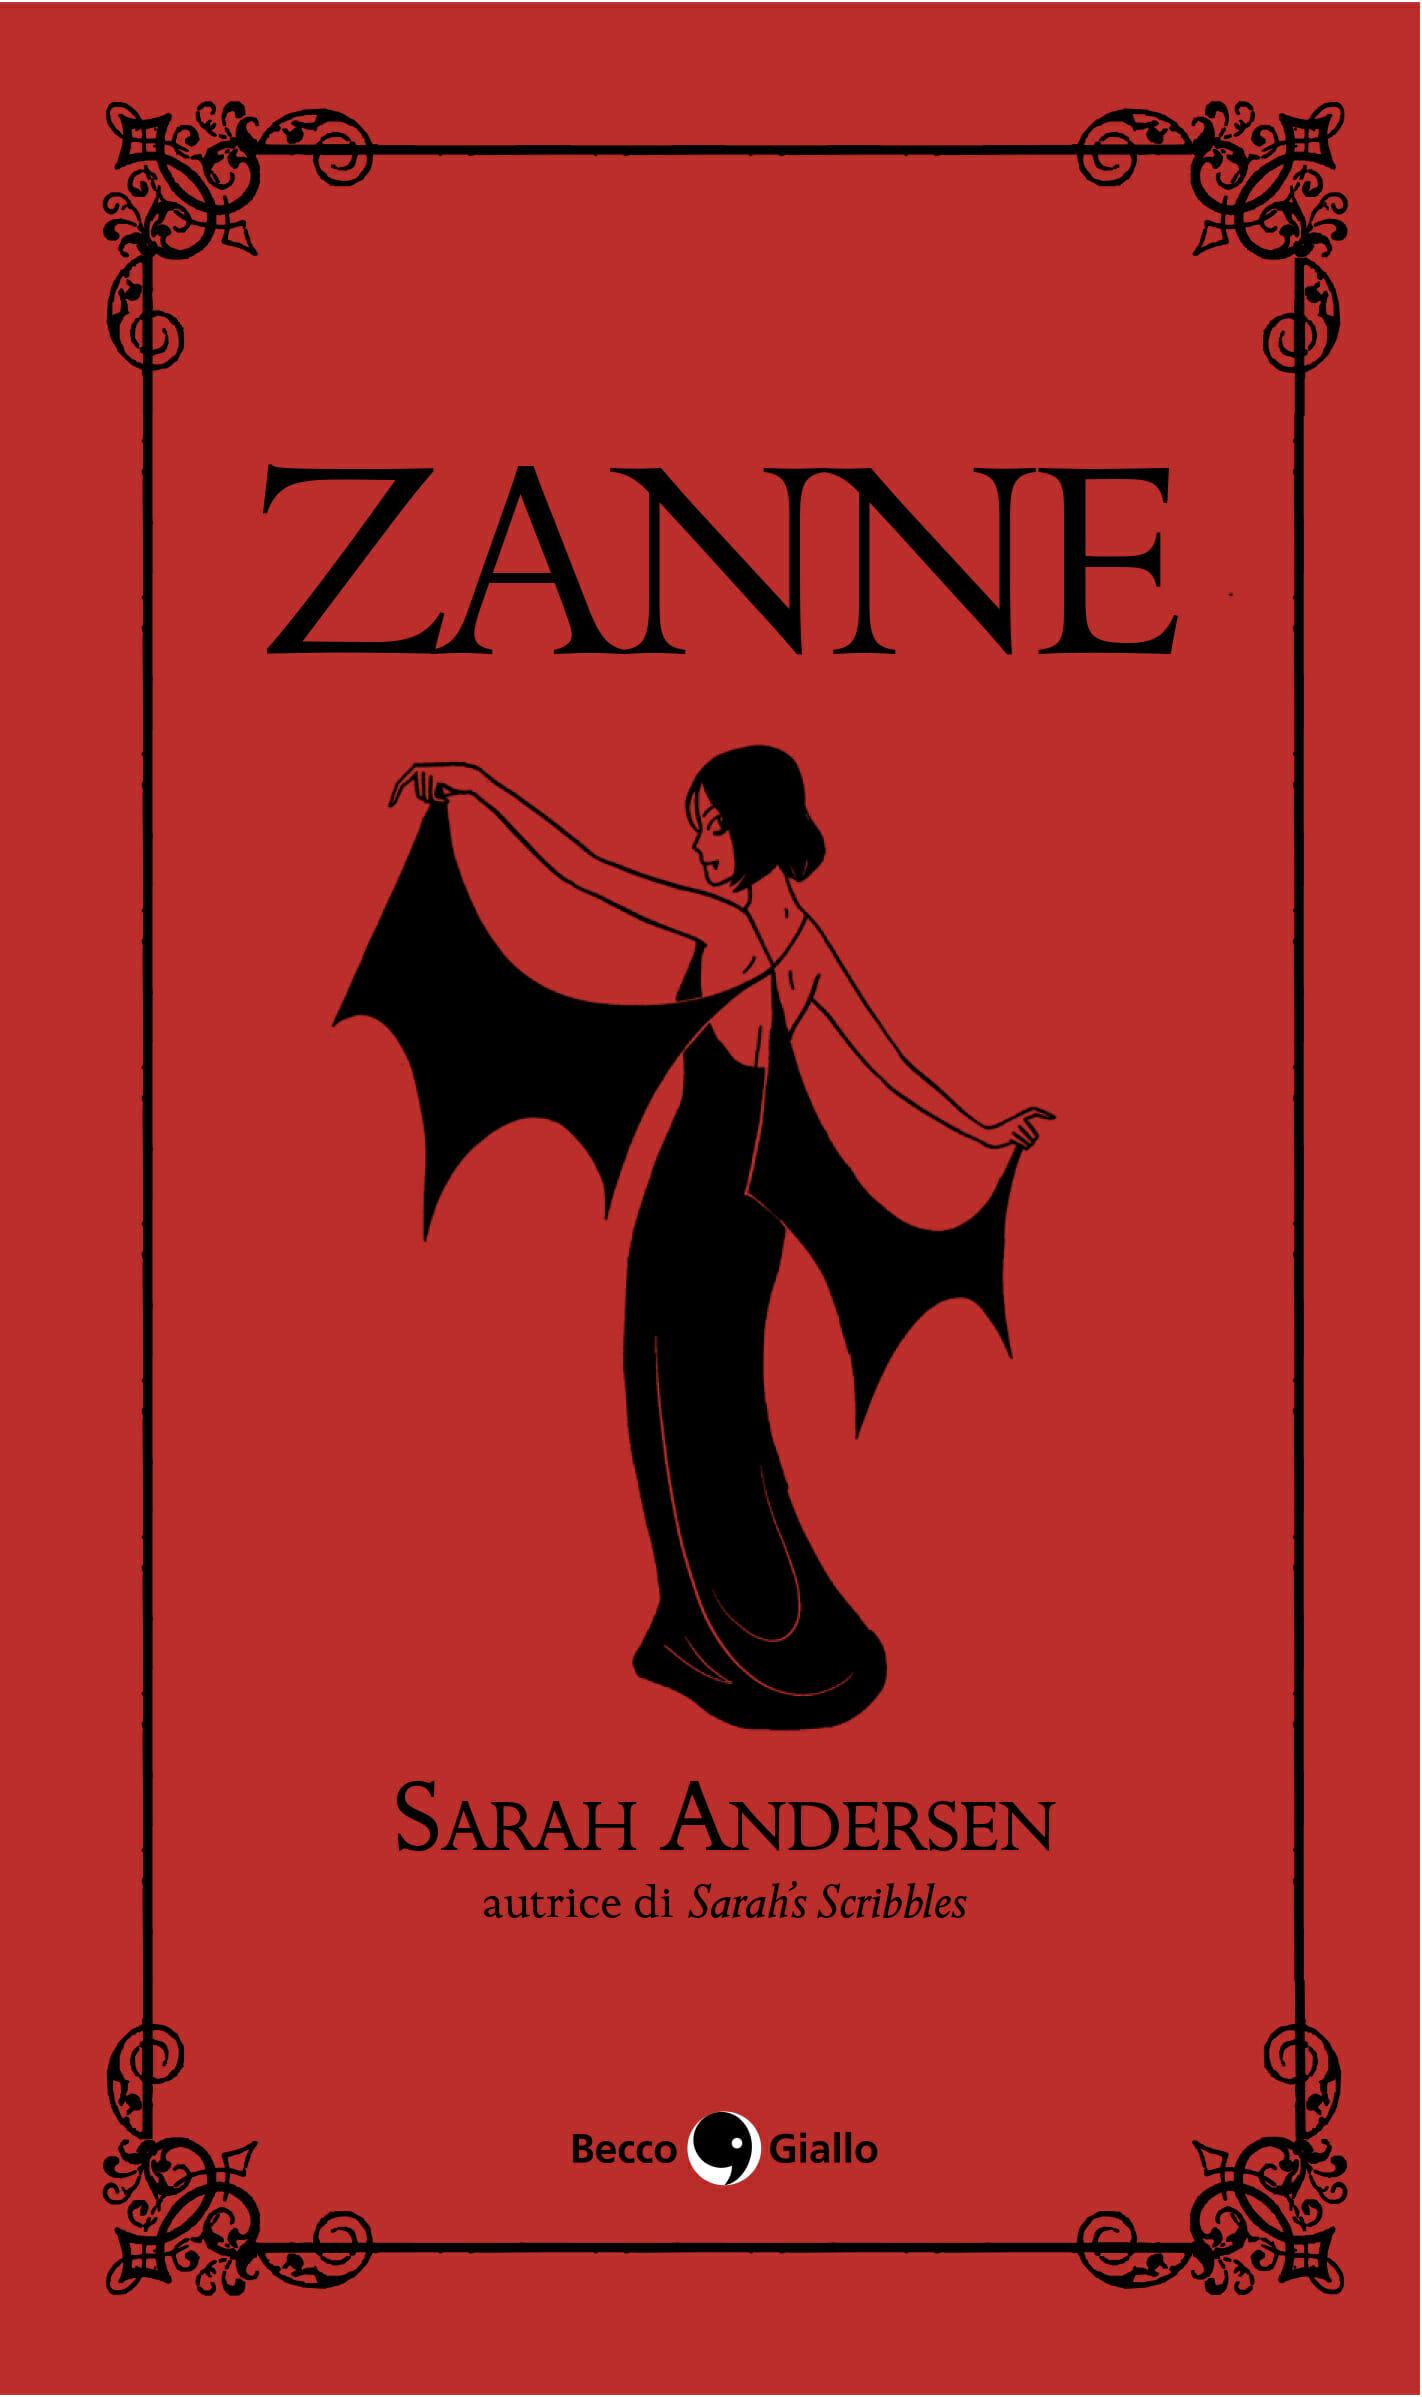 Fumetti da leggere Zanne